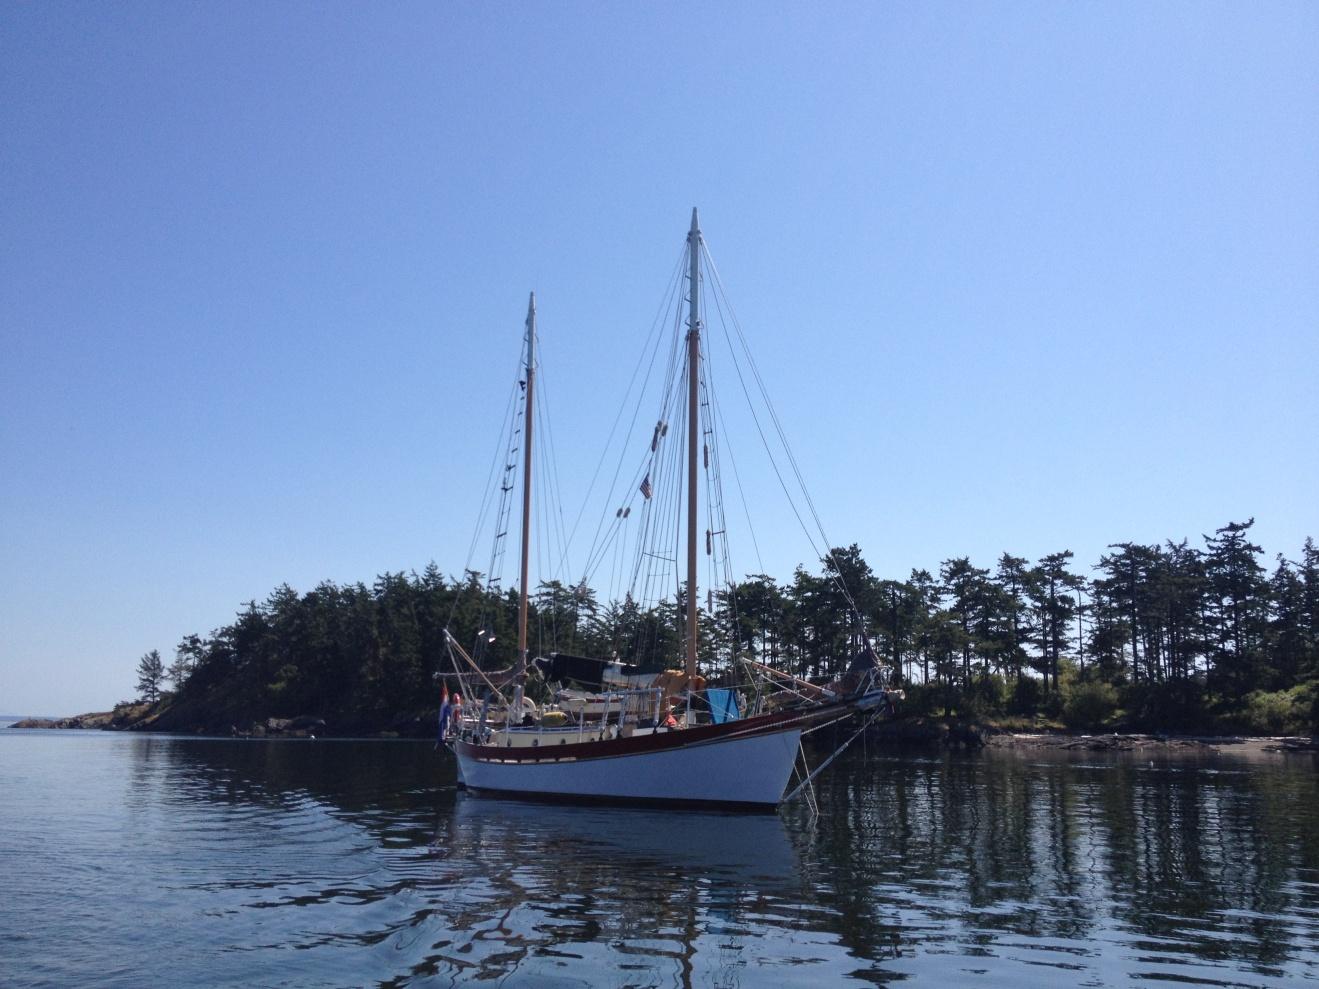 Click image for larger version  Name:San Juans Aug. 2012 208.jpg Views:89 Size:408.2 KB ID:45273